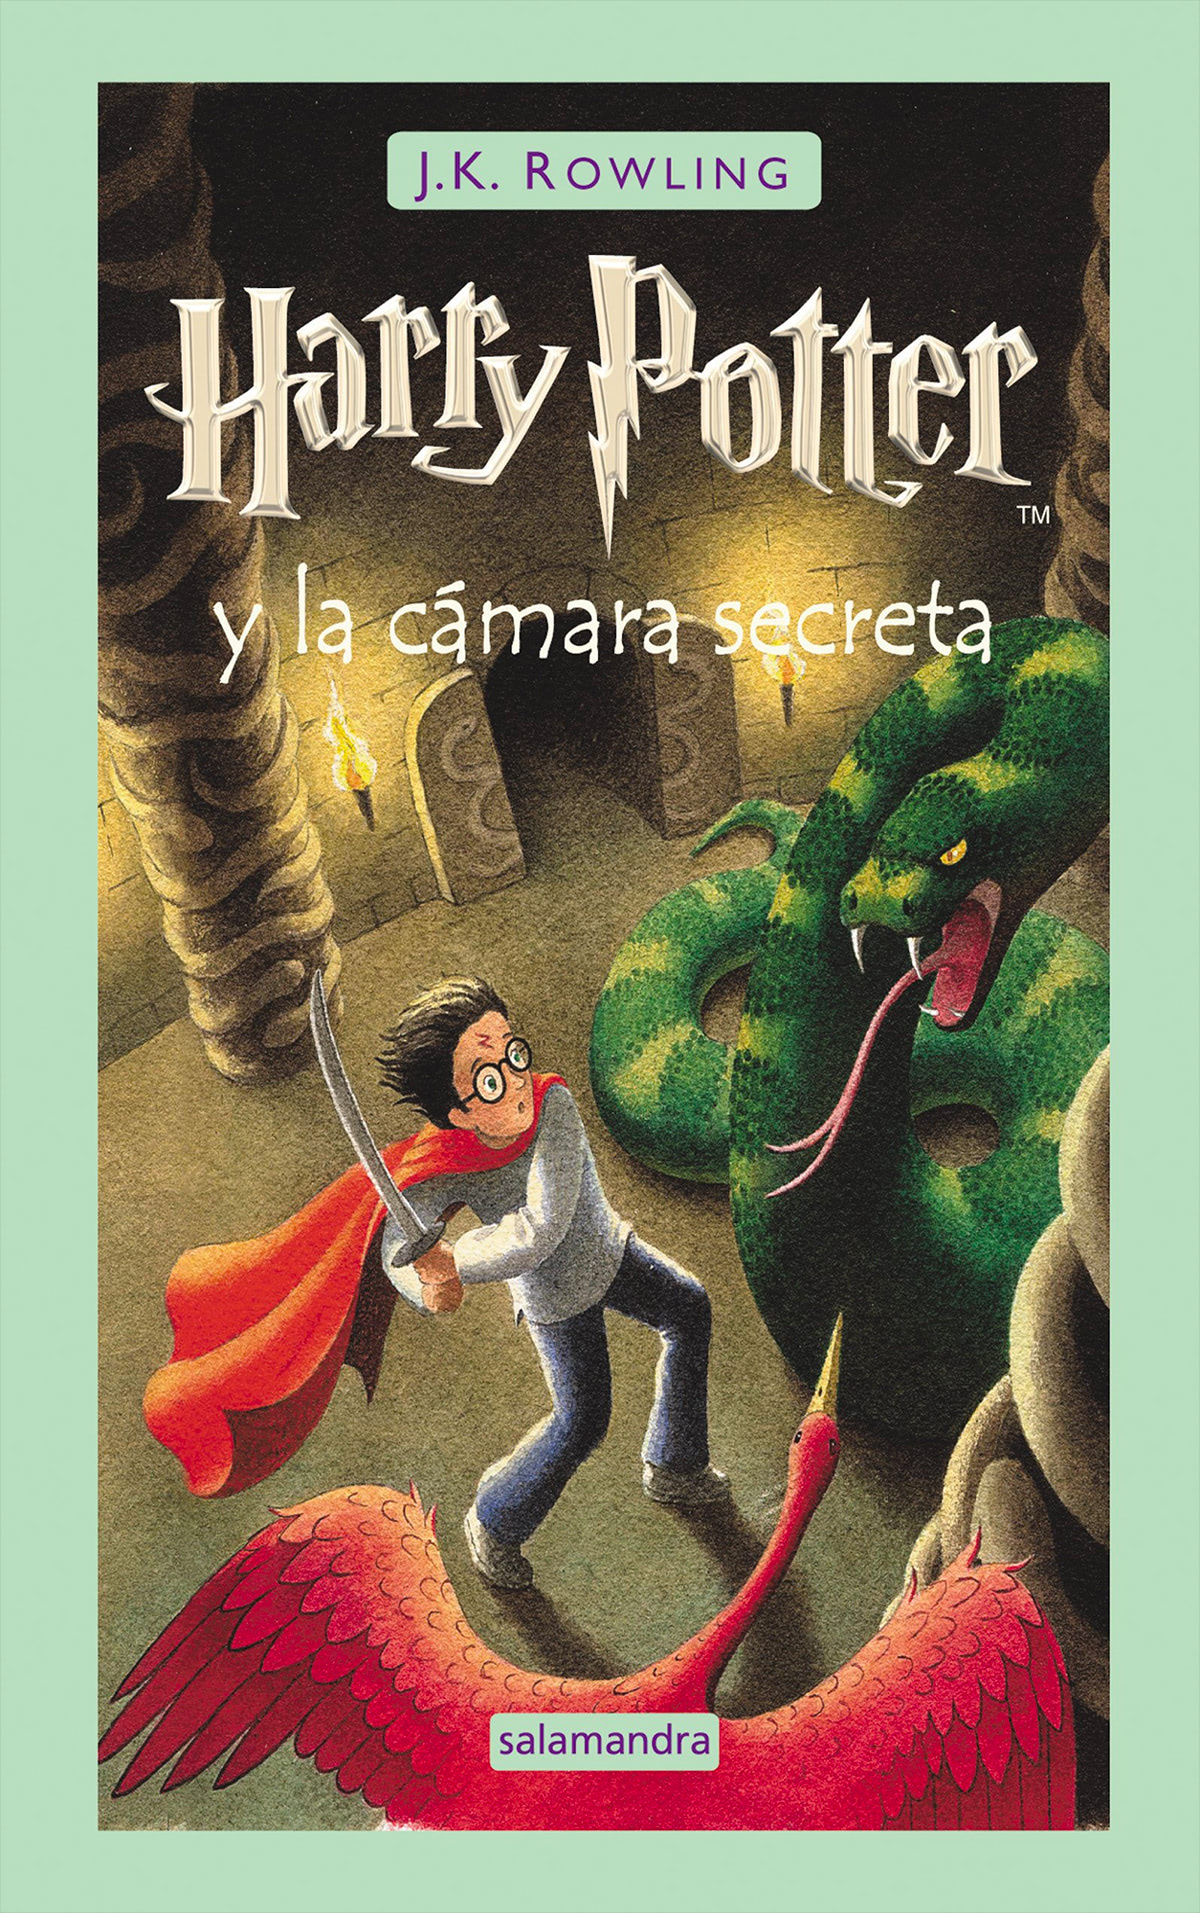 'Chamber of Secrets' Spanish edition